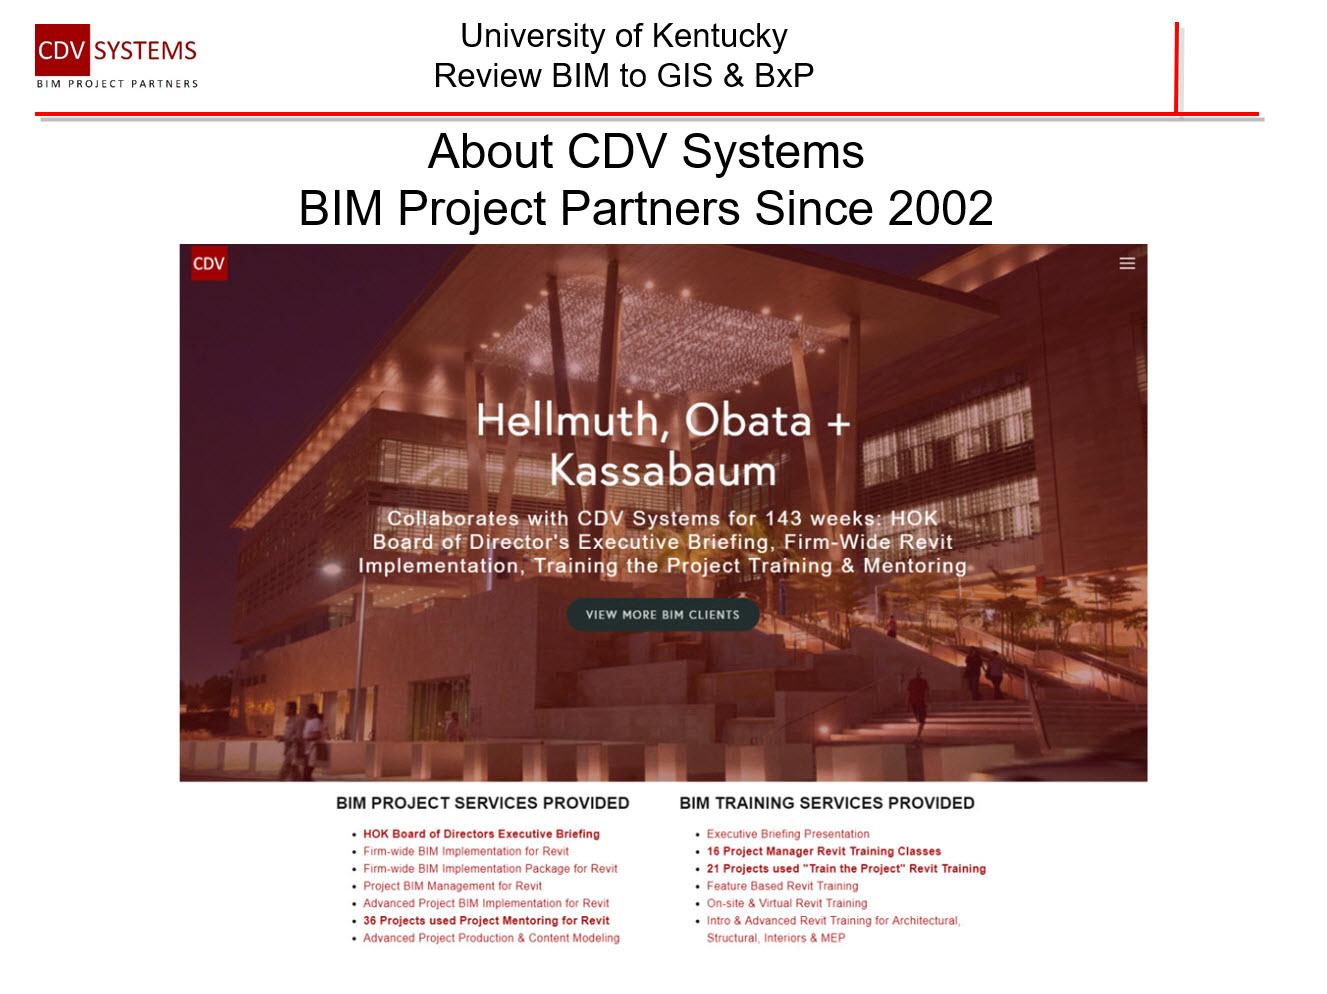 University of Kentucky_001g.jpg